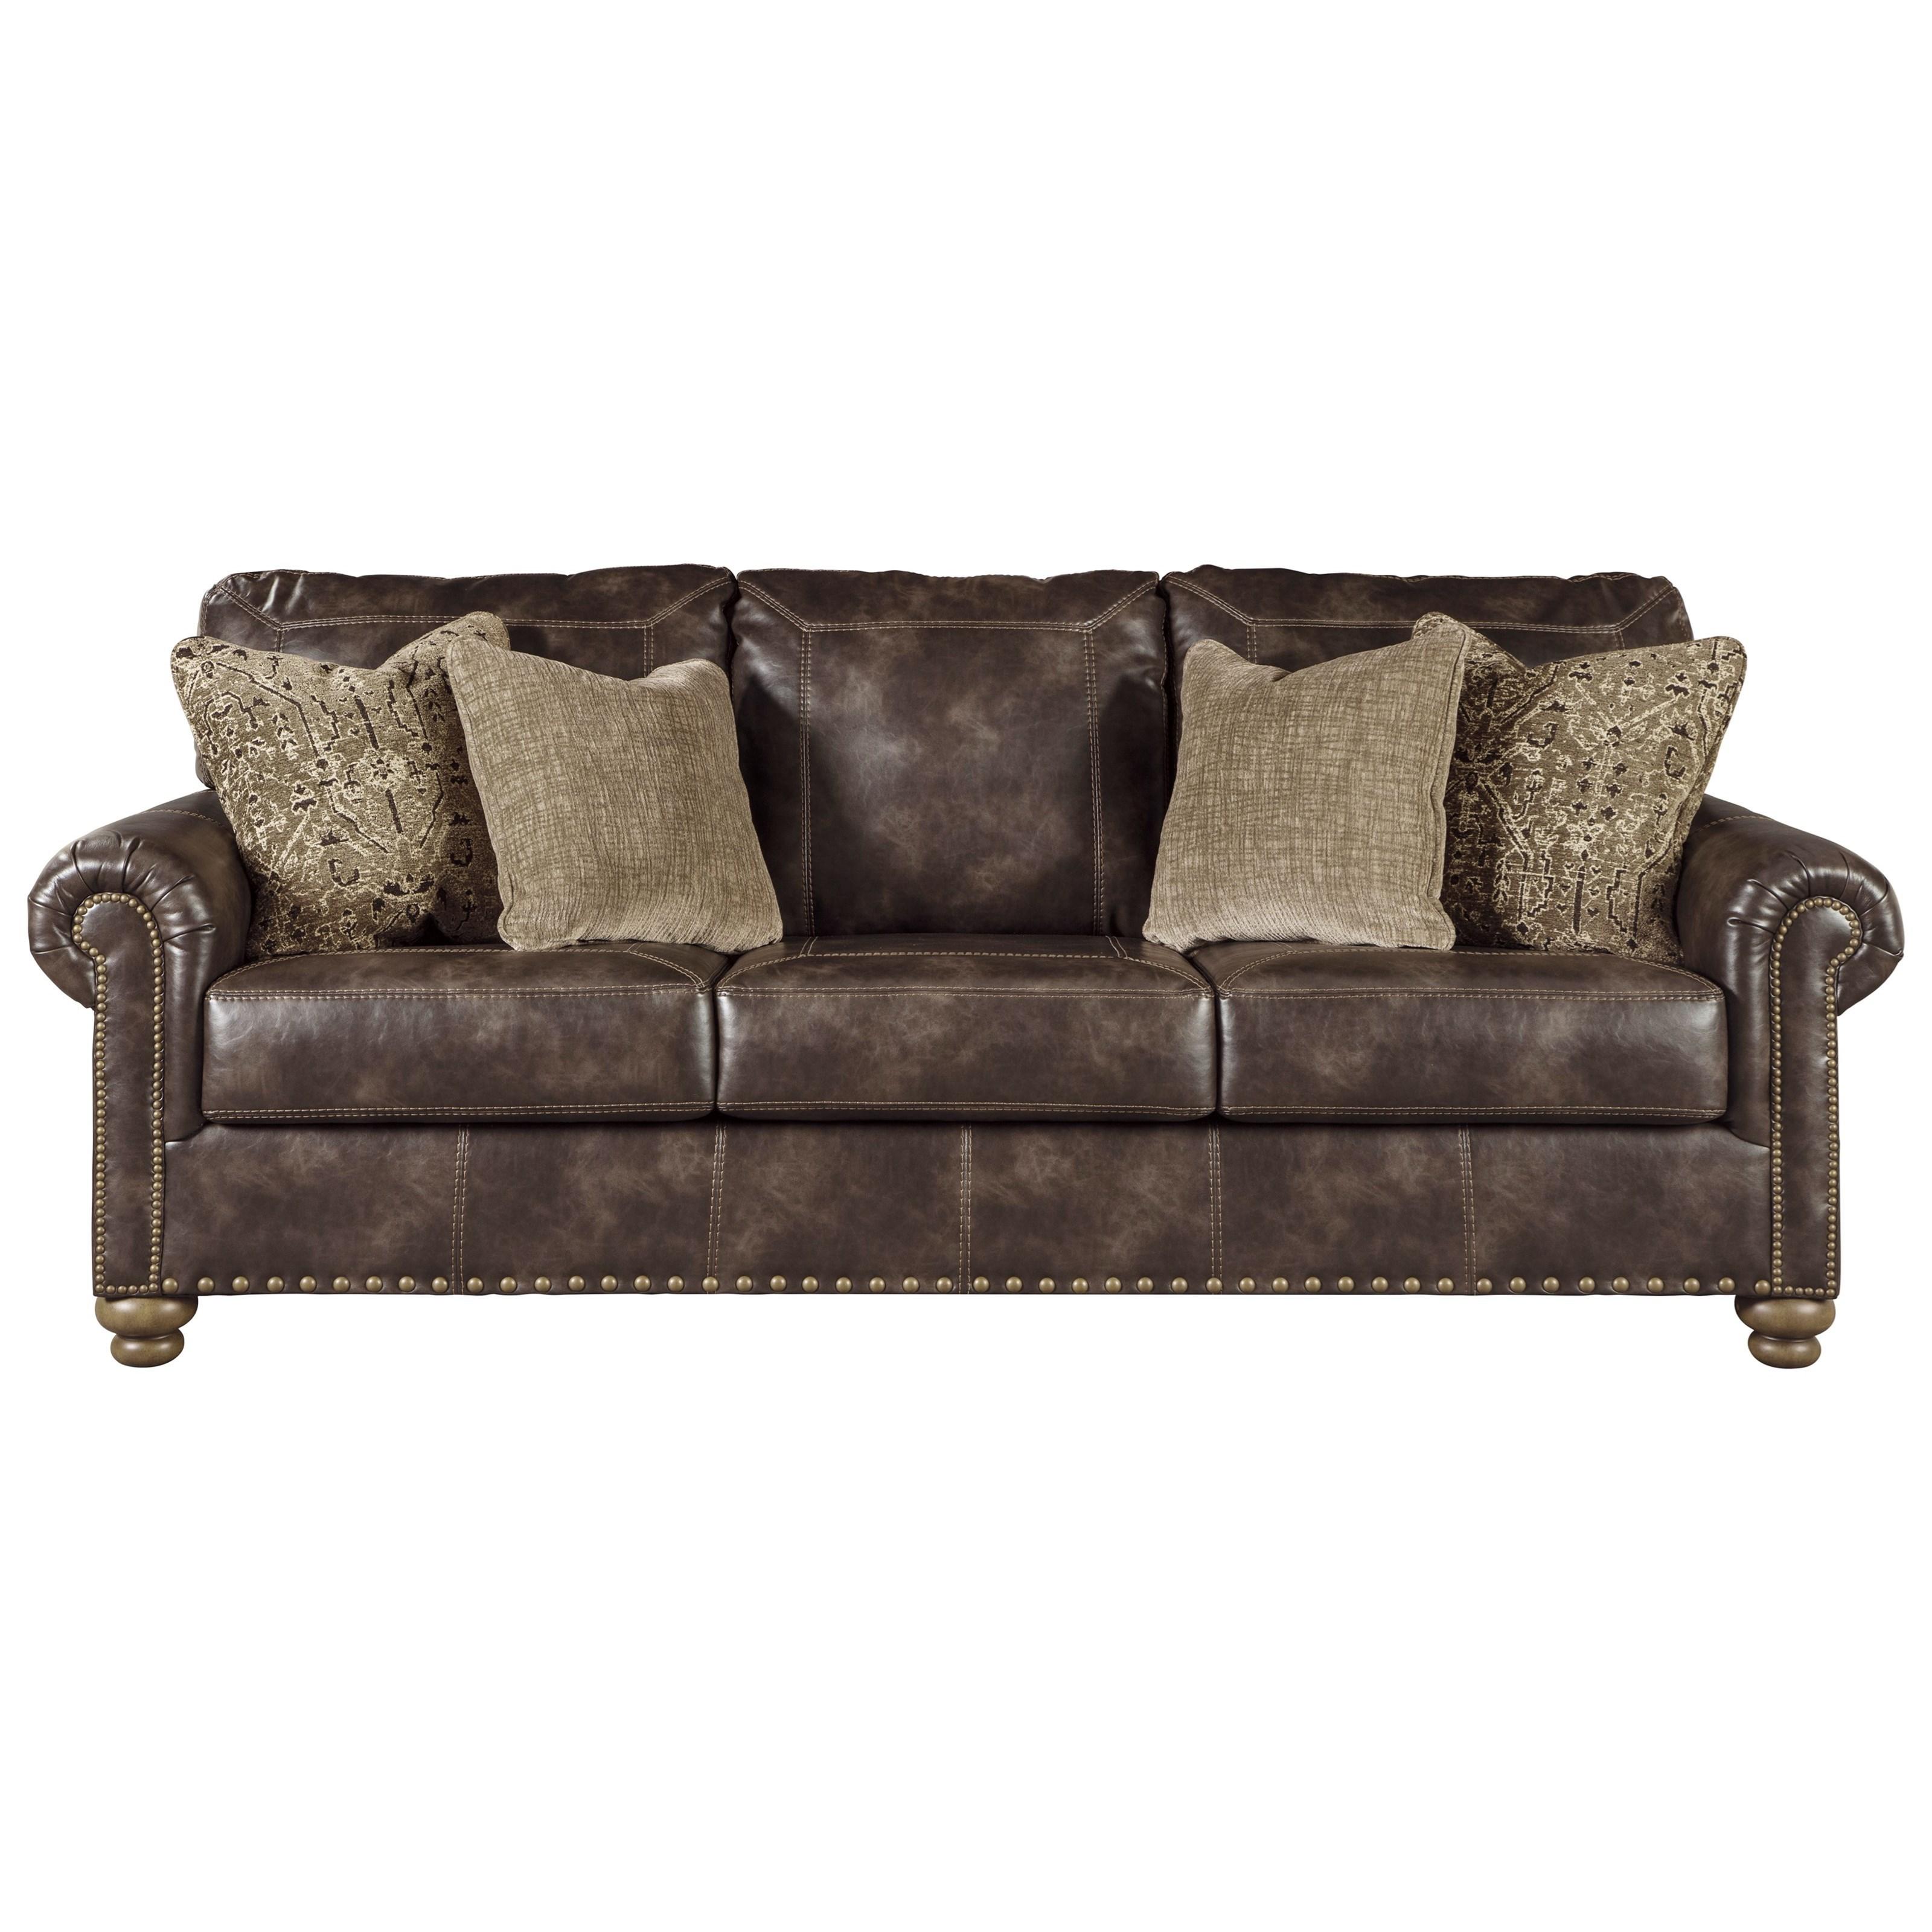 Nicorvo Sofa by Signature Design by Ashley at A1 Furniture & Mattress